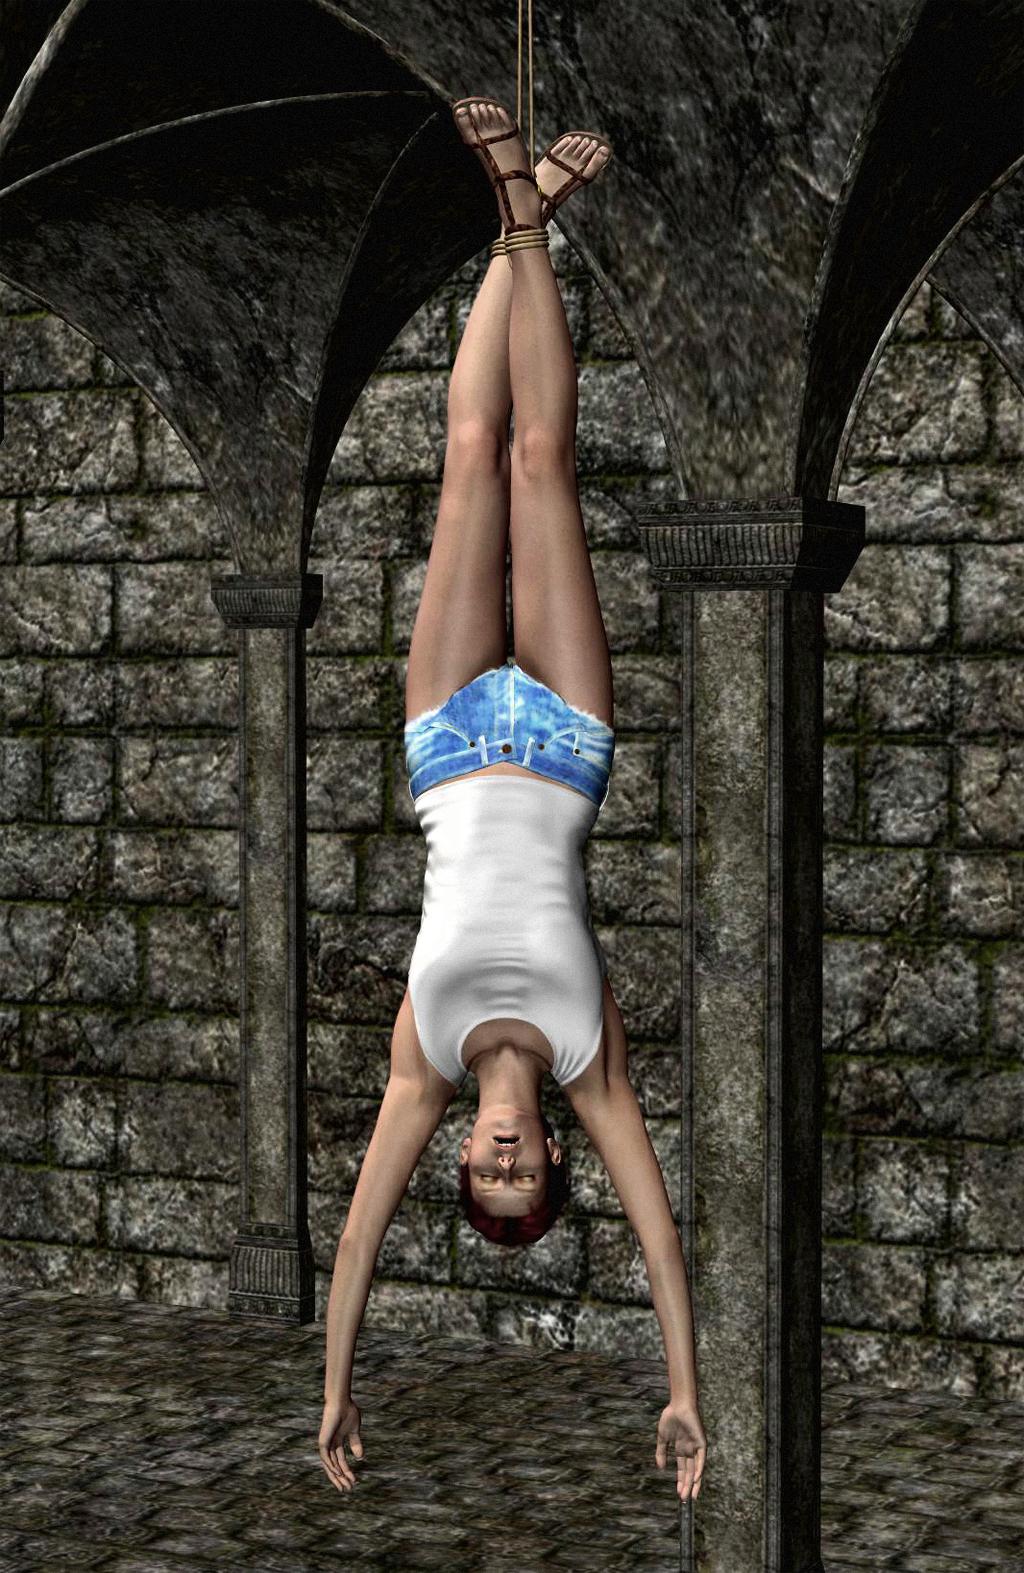 nude girls hanging upside fown